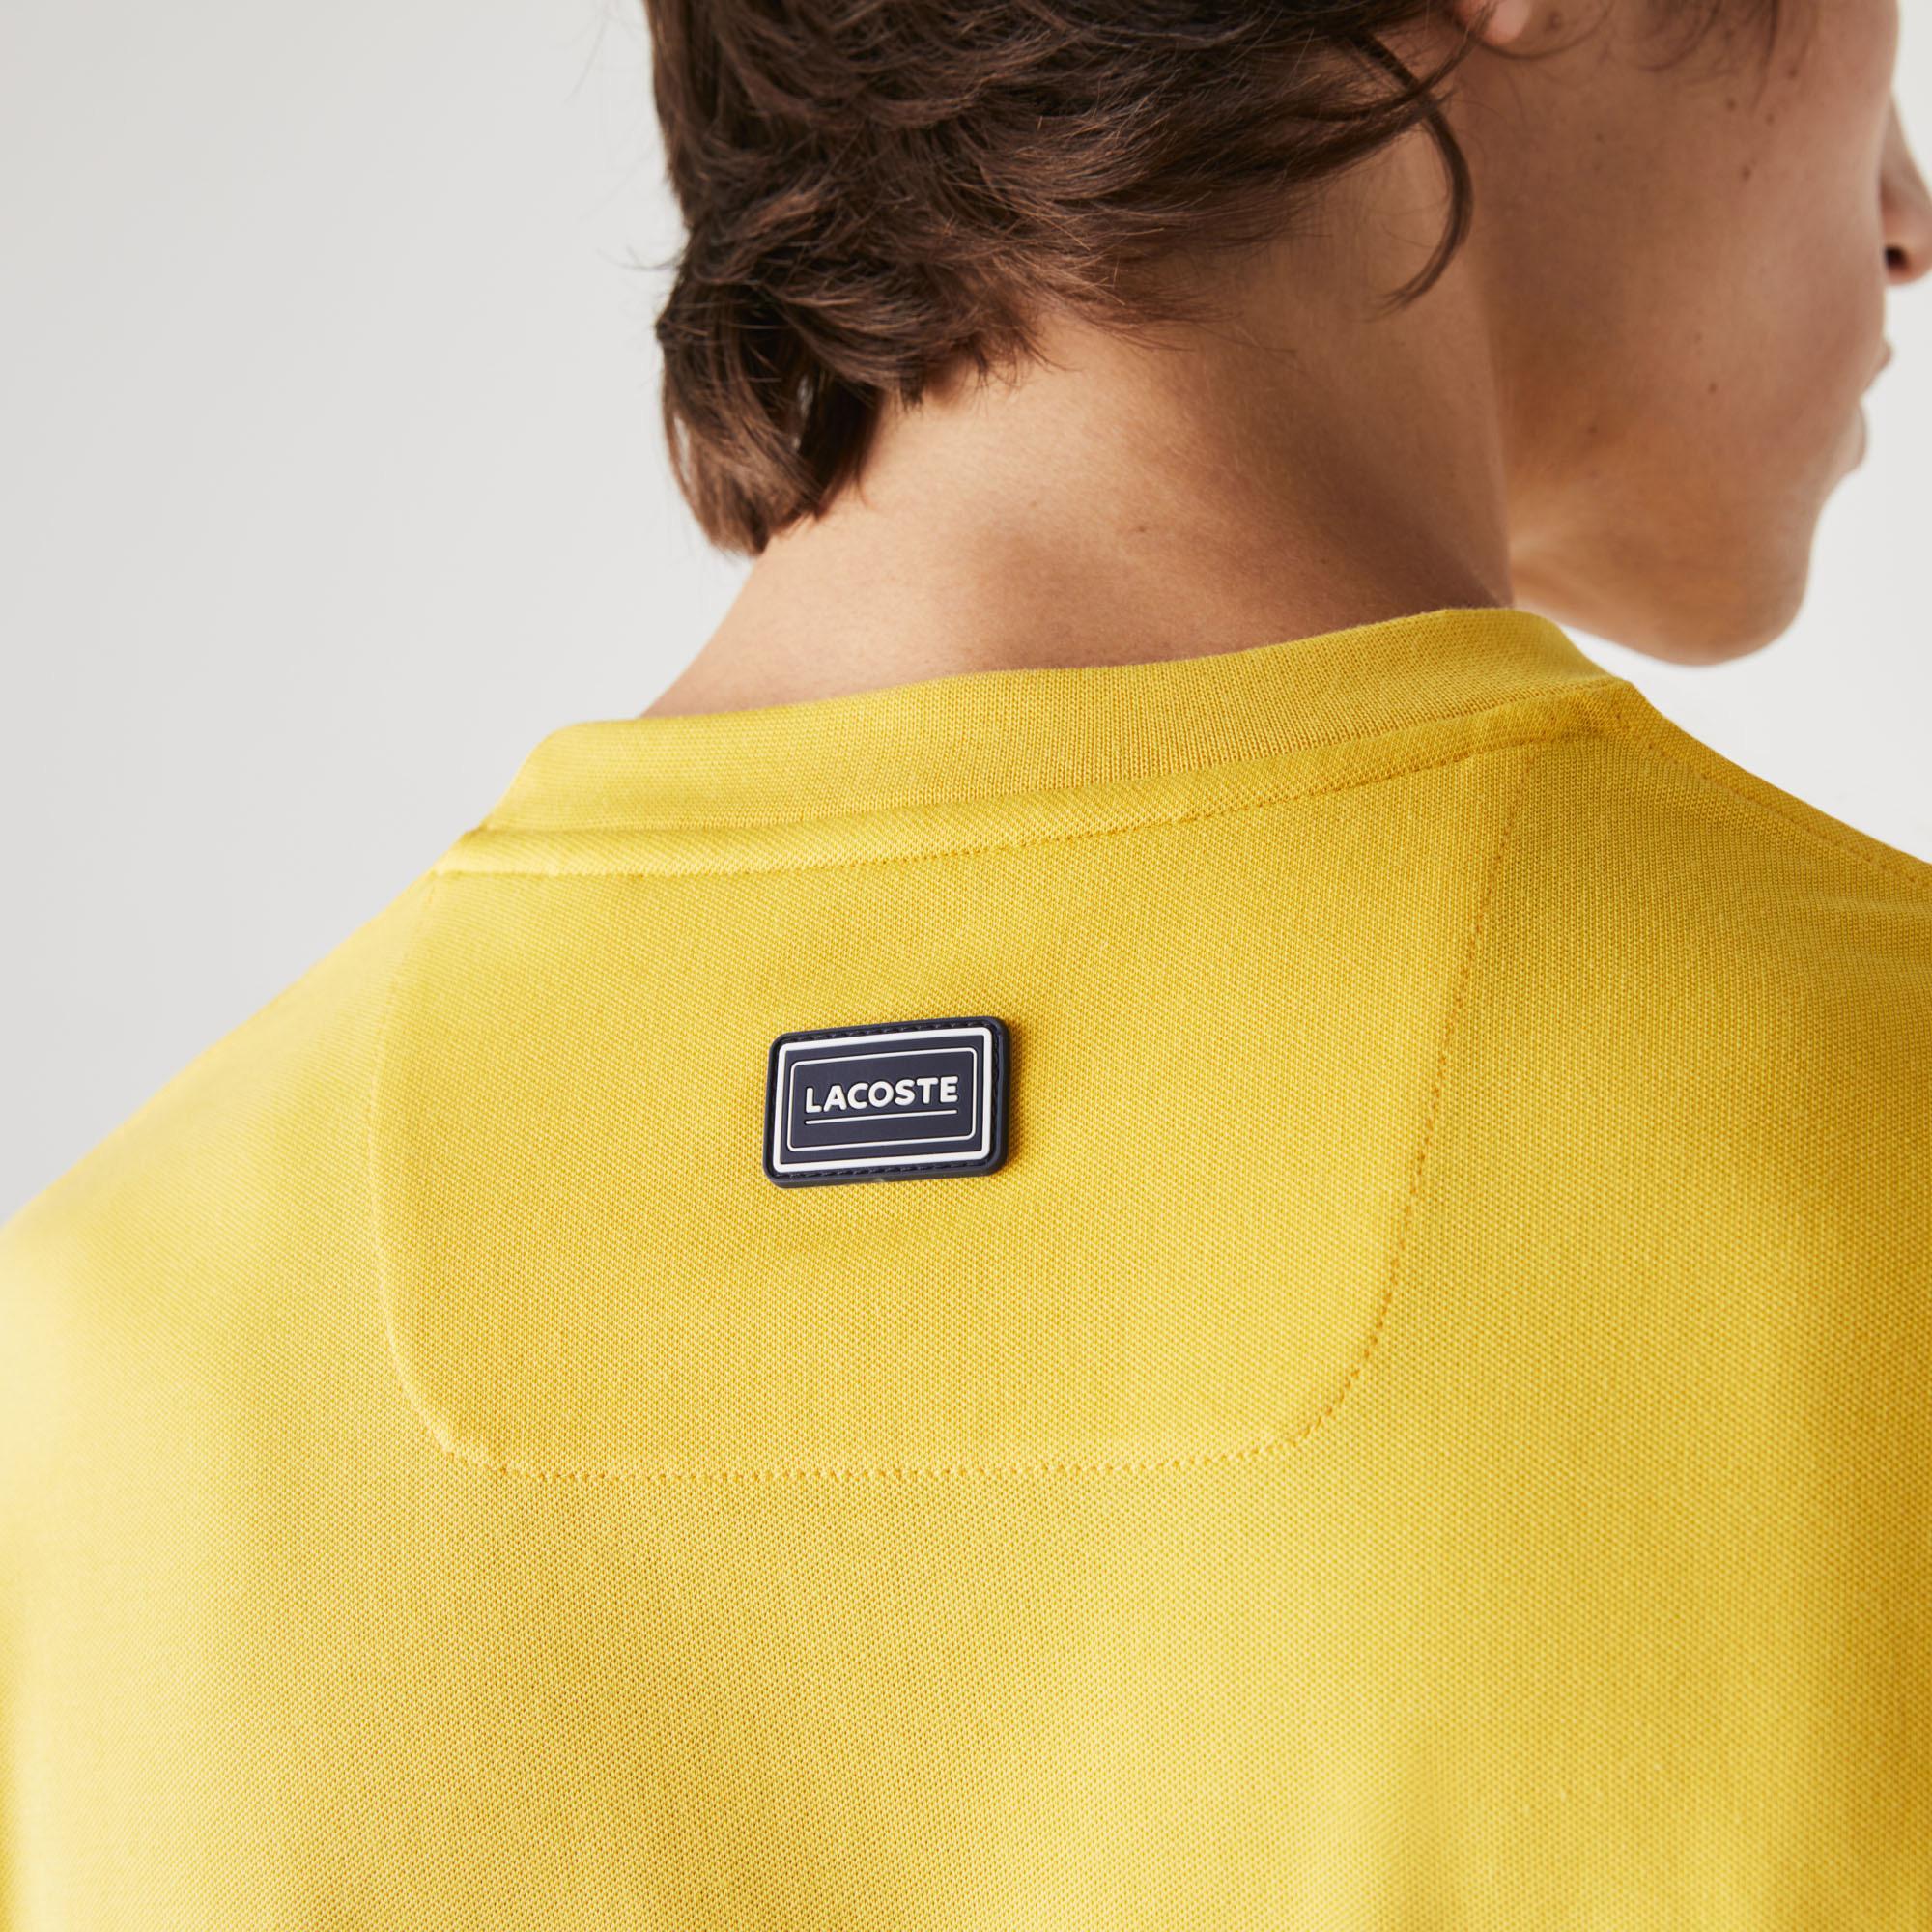 Lacoste Erkek Rahat Fit Bisiklet Yaka Renk Bloklu Sarı T-Shirt